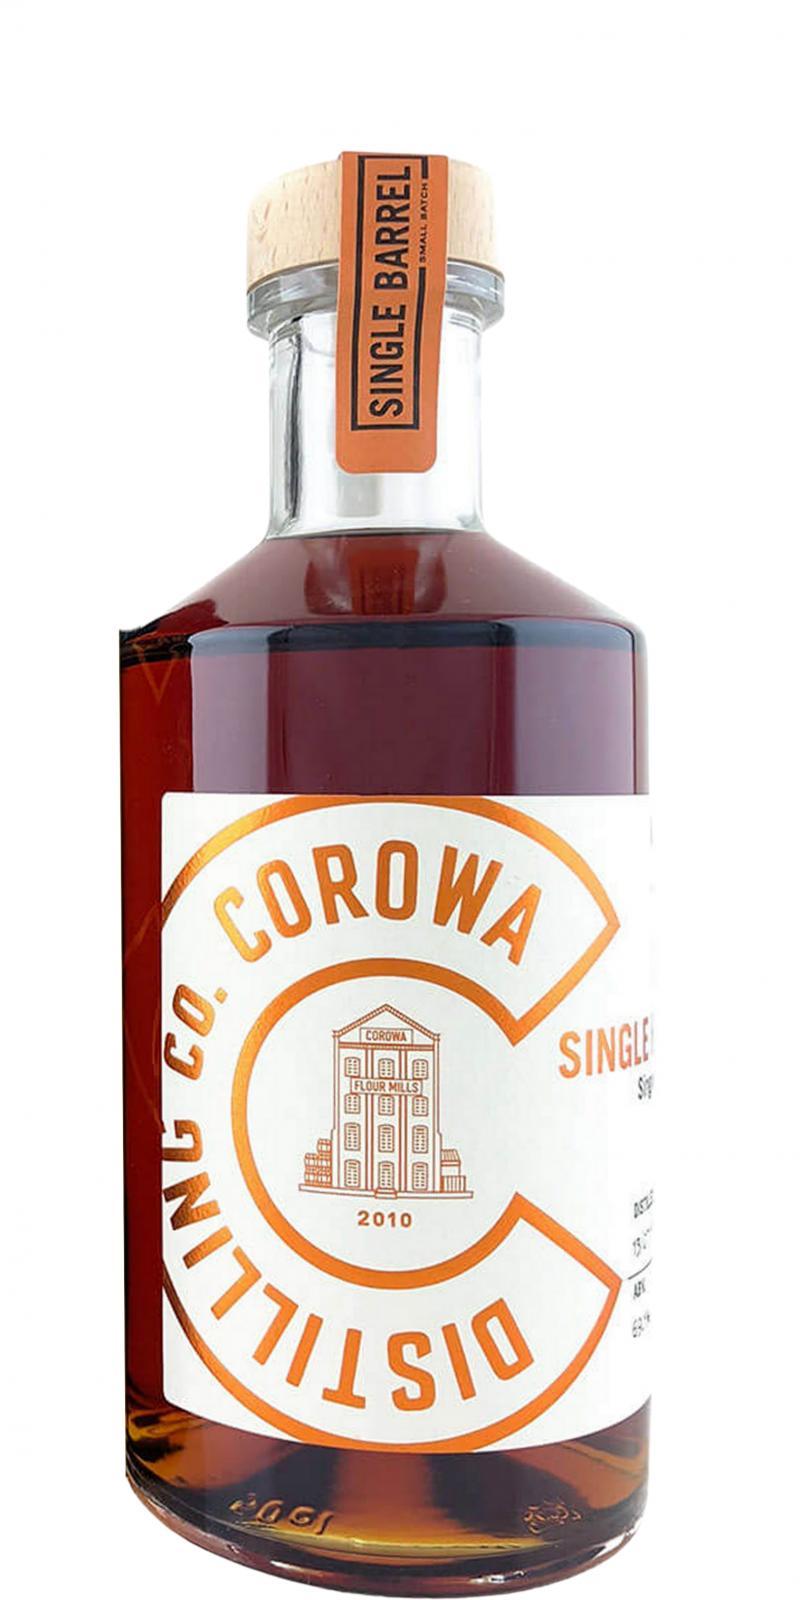 Corowa Distilling Co. 2017